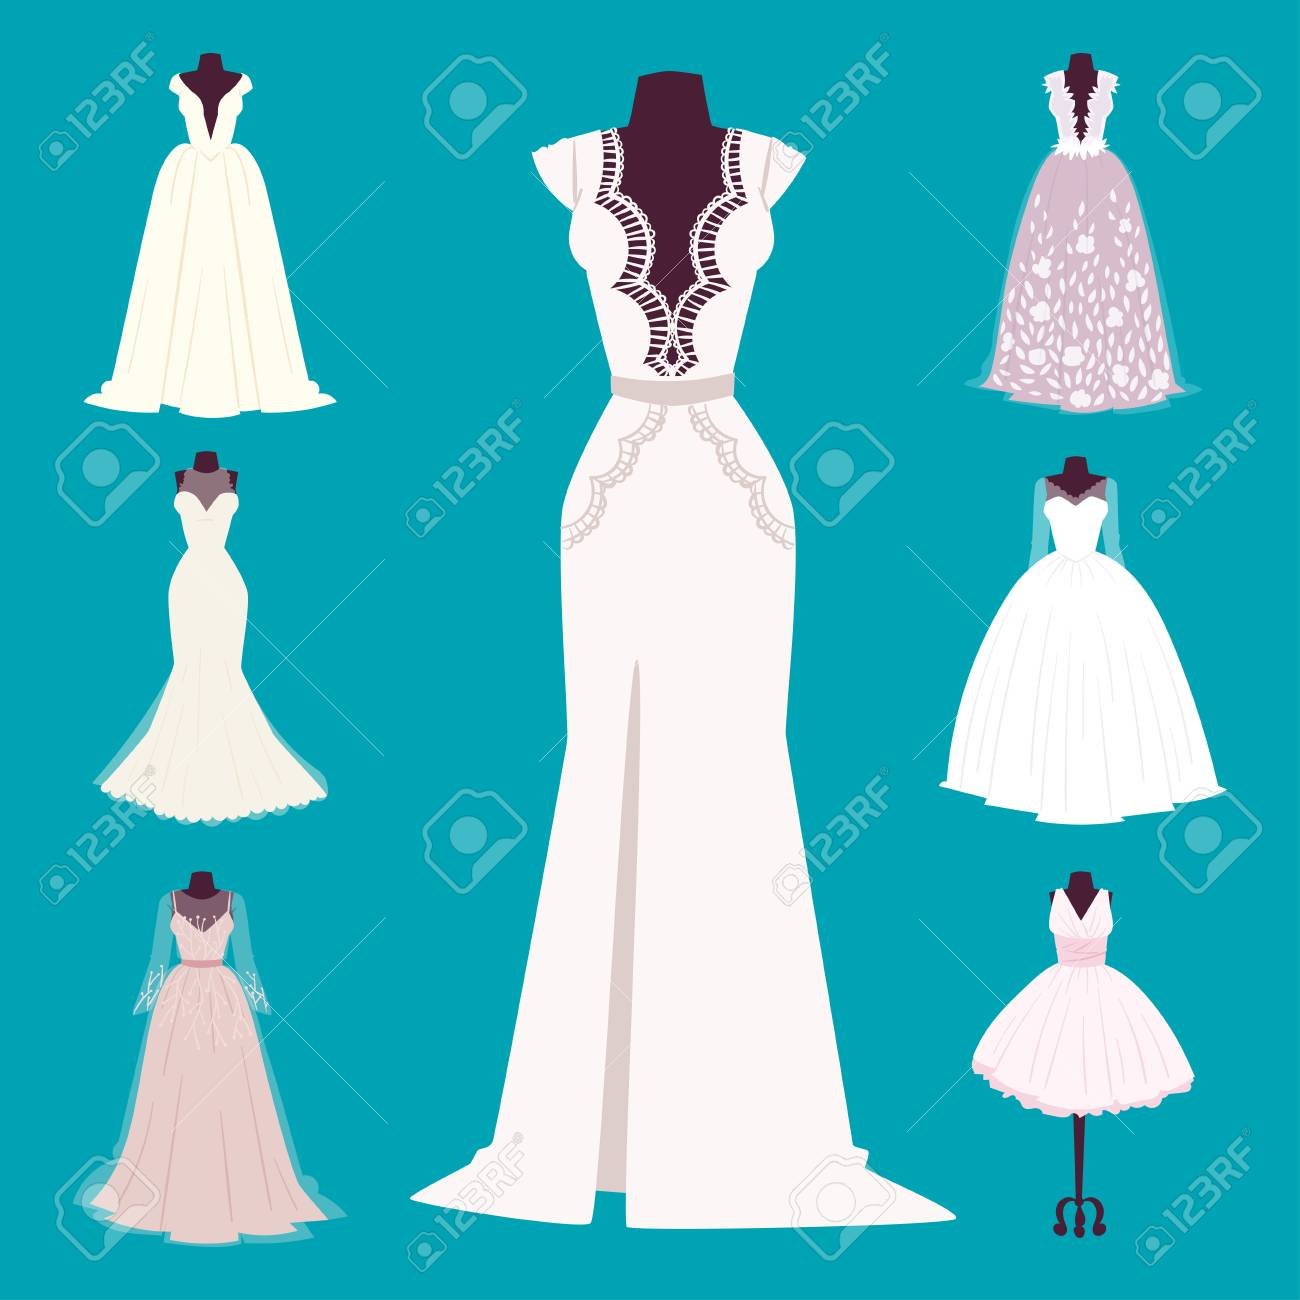 Wedding Bride Dress Elegance Style Celebration Bridal Shower Stock